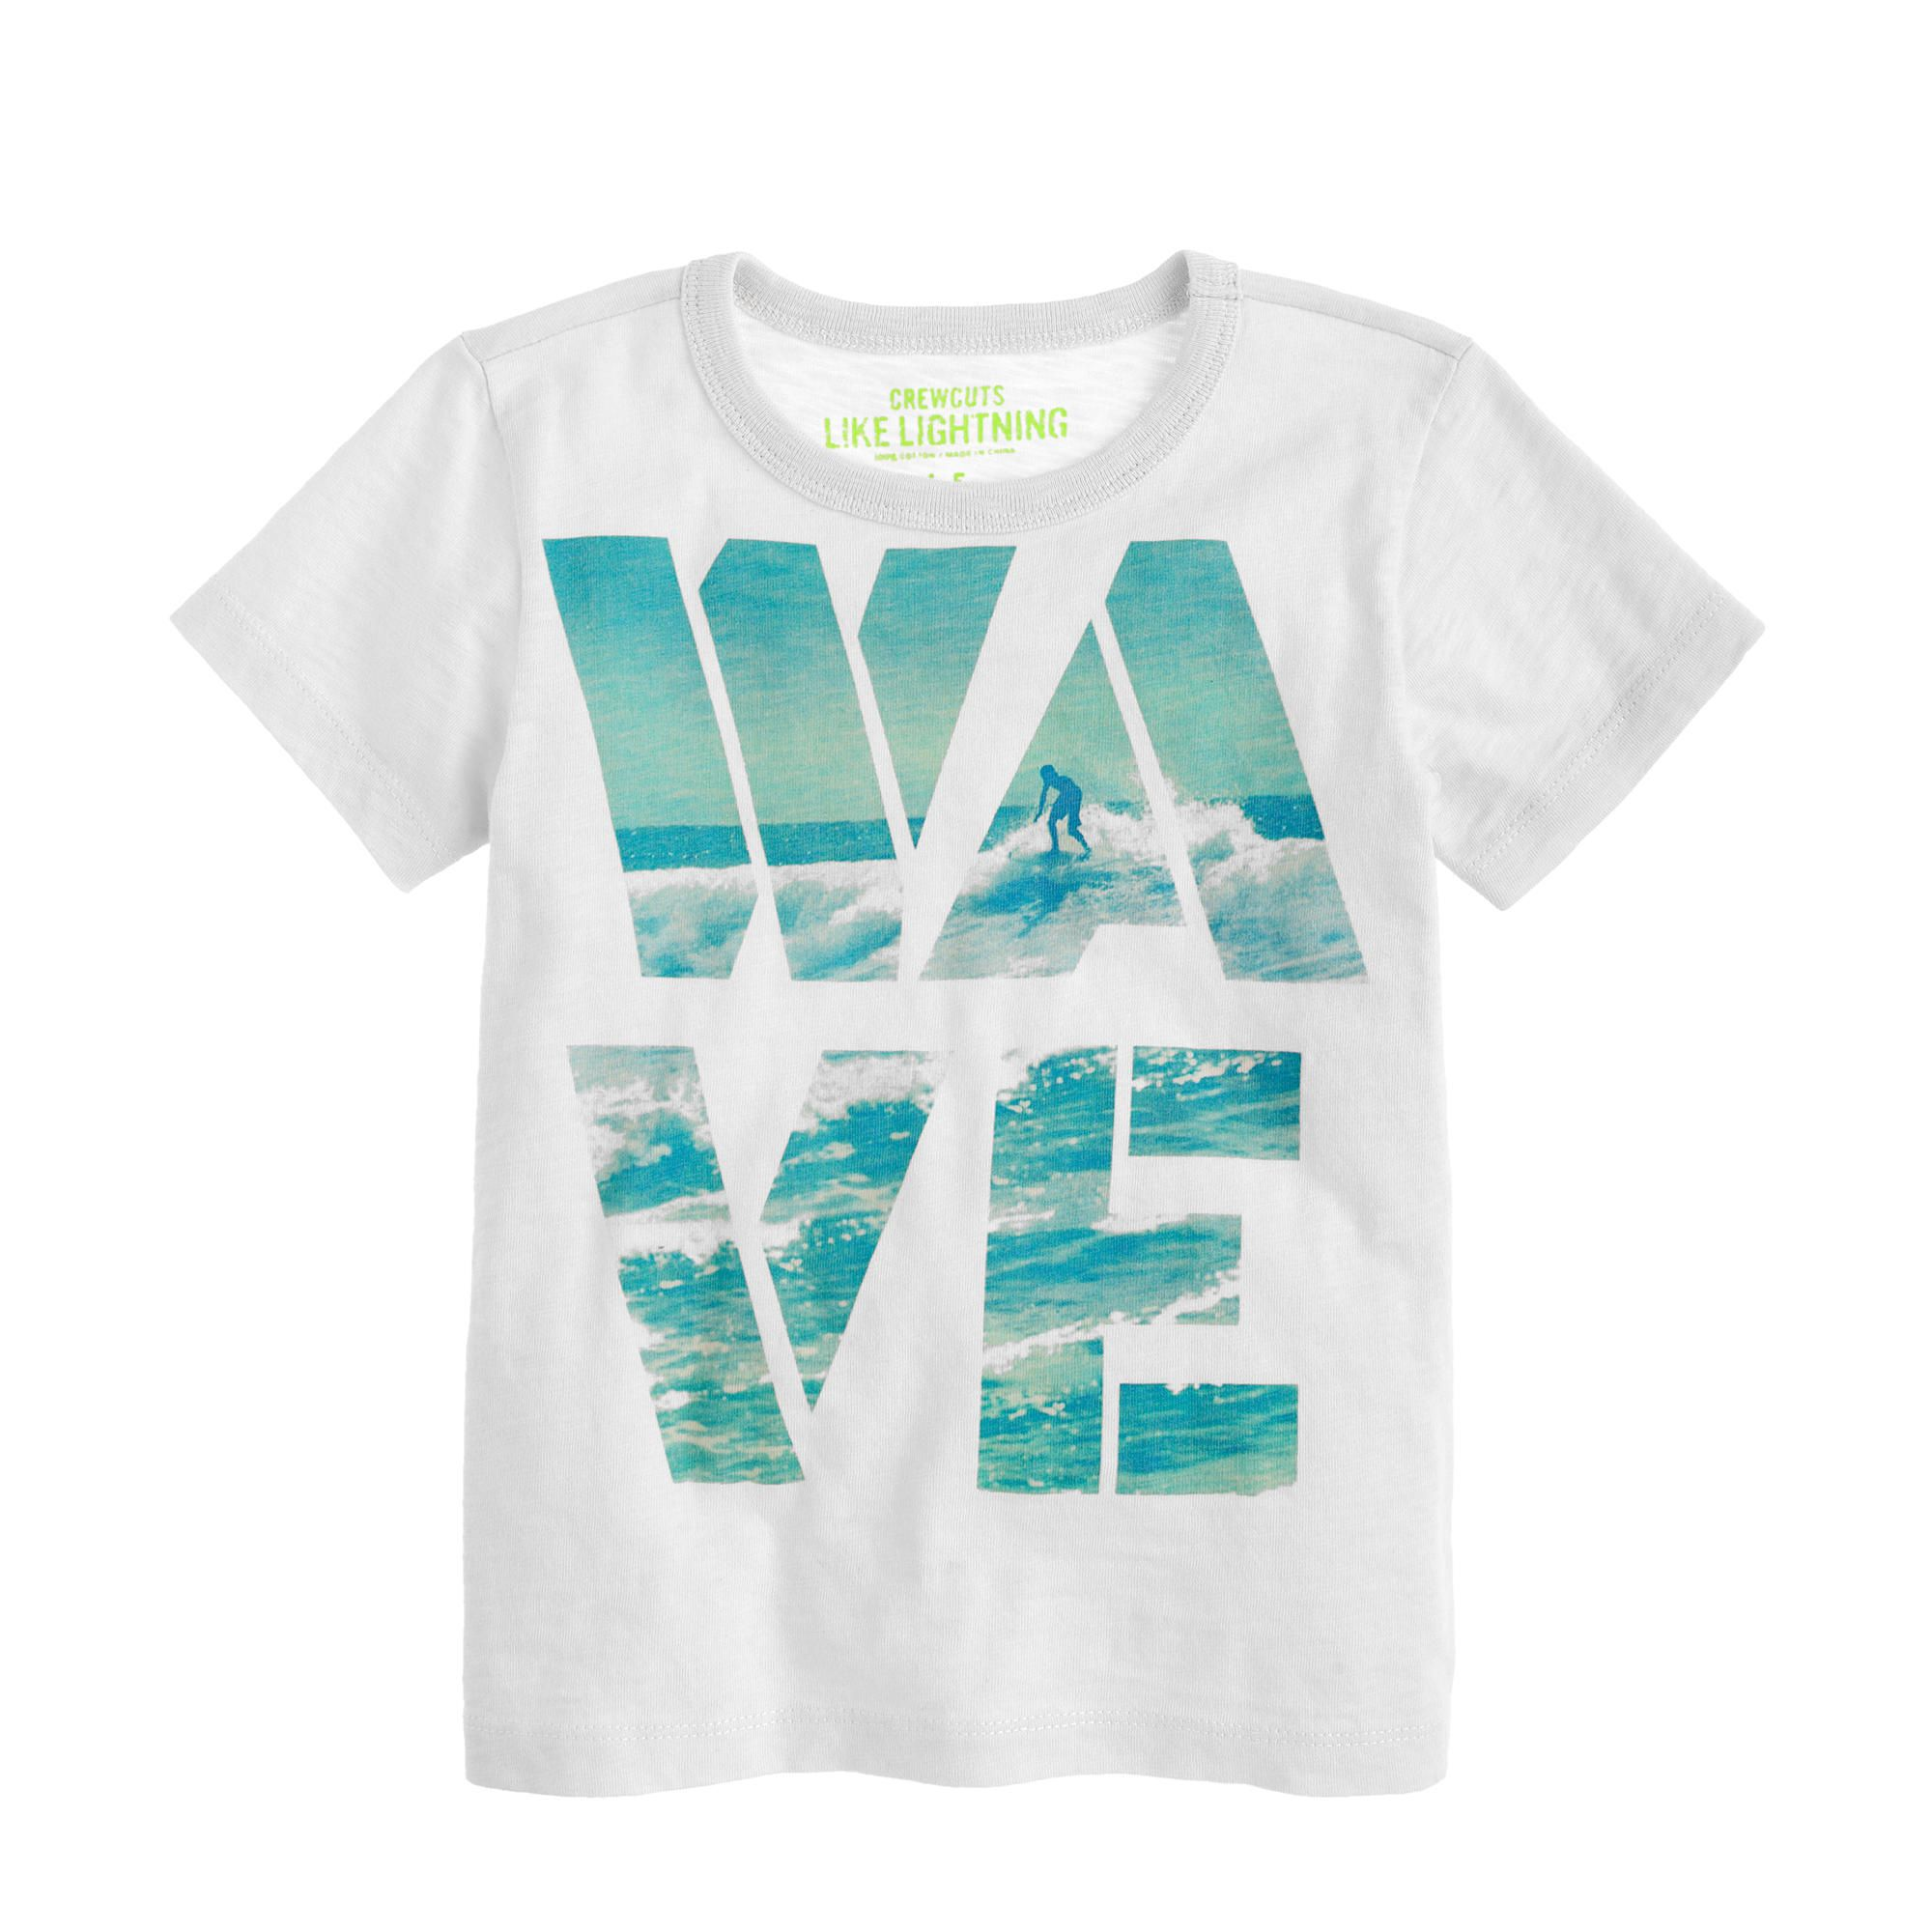 Boys' wave tee   Boys t shirts, Boys graphic tee, Boys fashion trends